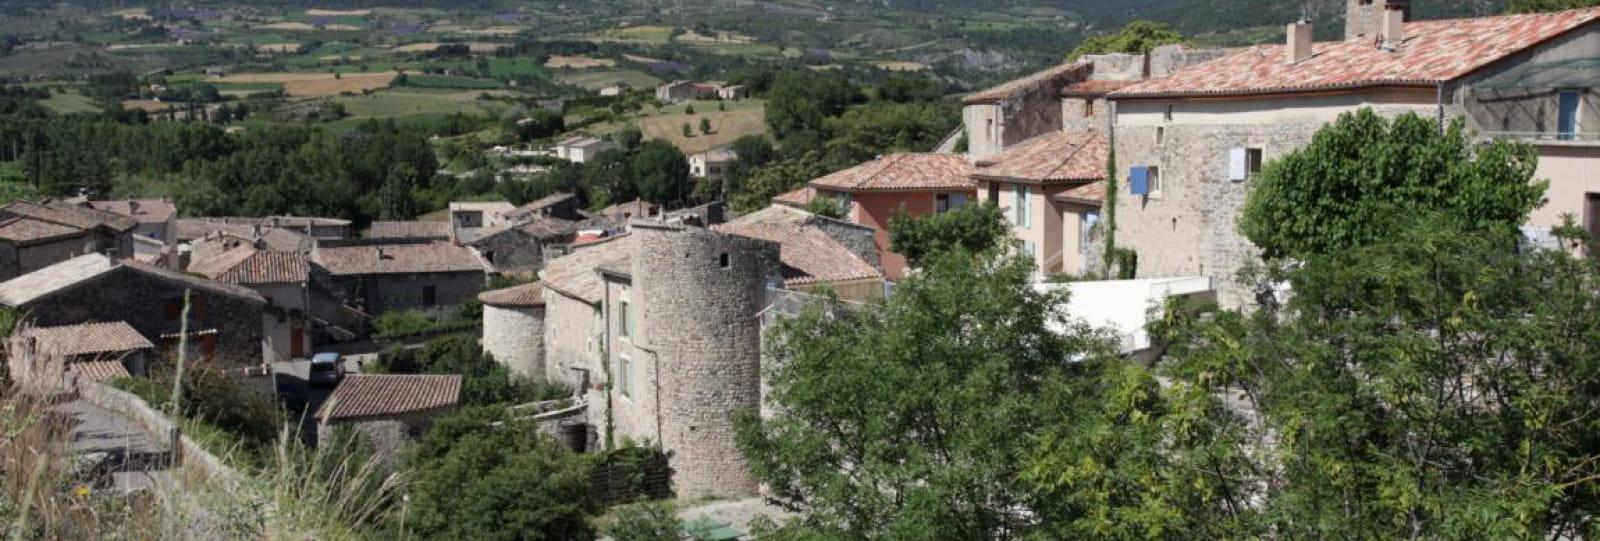 Sainte-Jalle